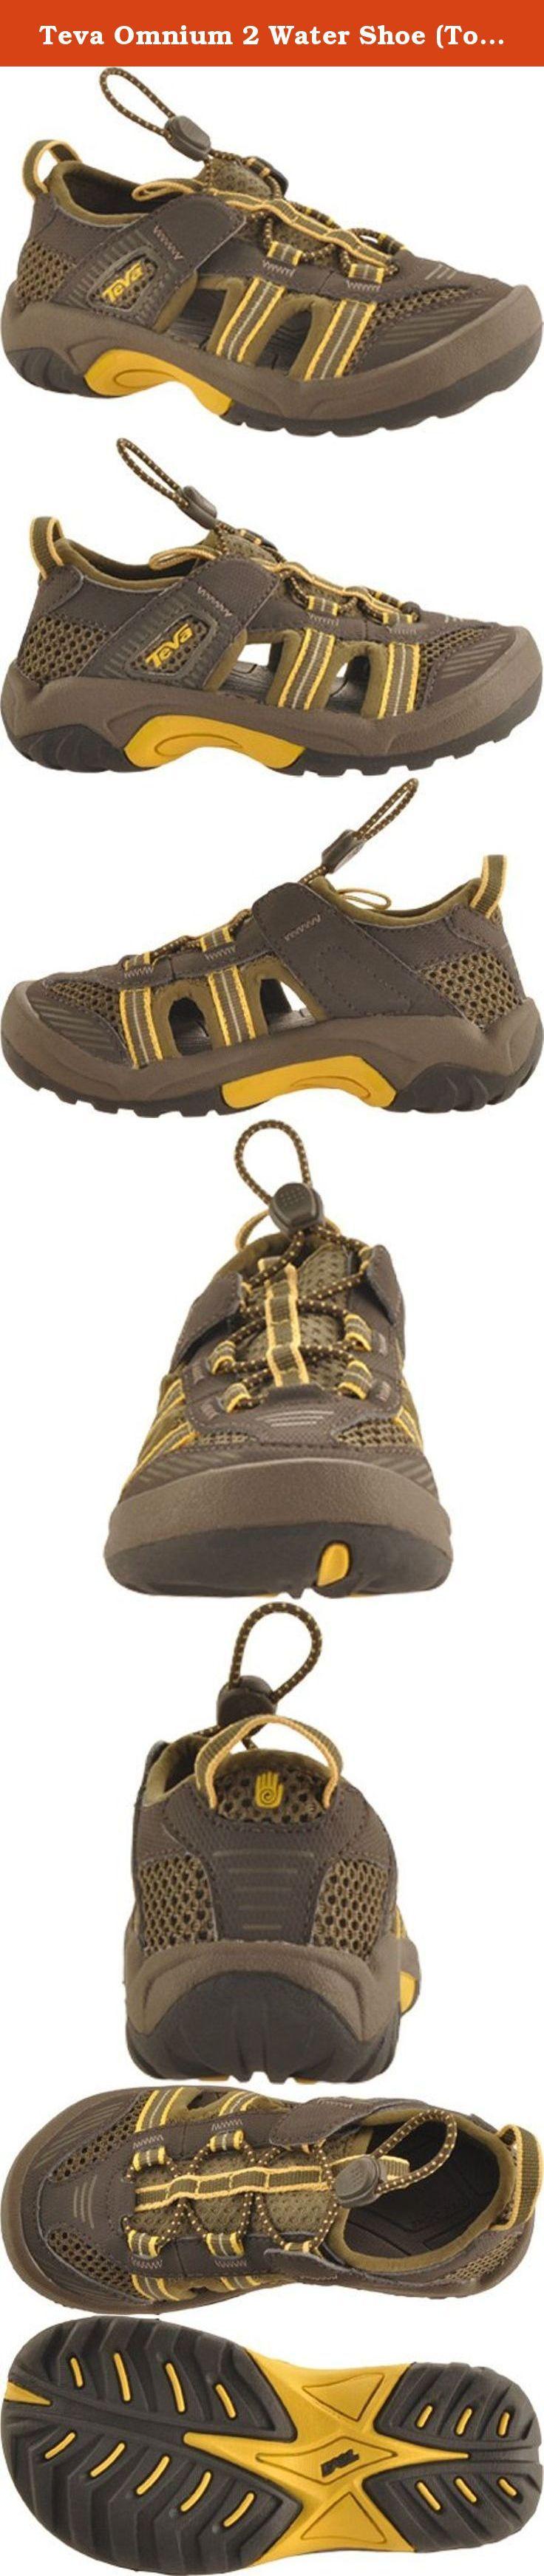 Teva Omnium 2 Water Shoe (Toddler/Little Kid/Big Kid),Dark Olive,10 M US Toddler. Teva Kids Omnium 2 .